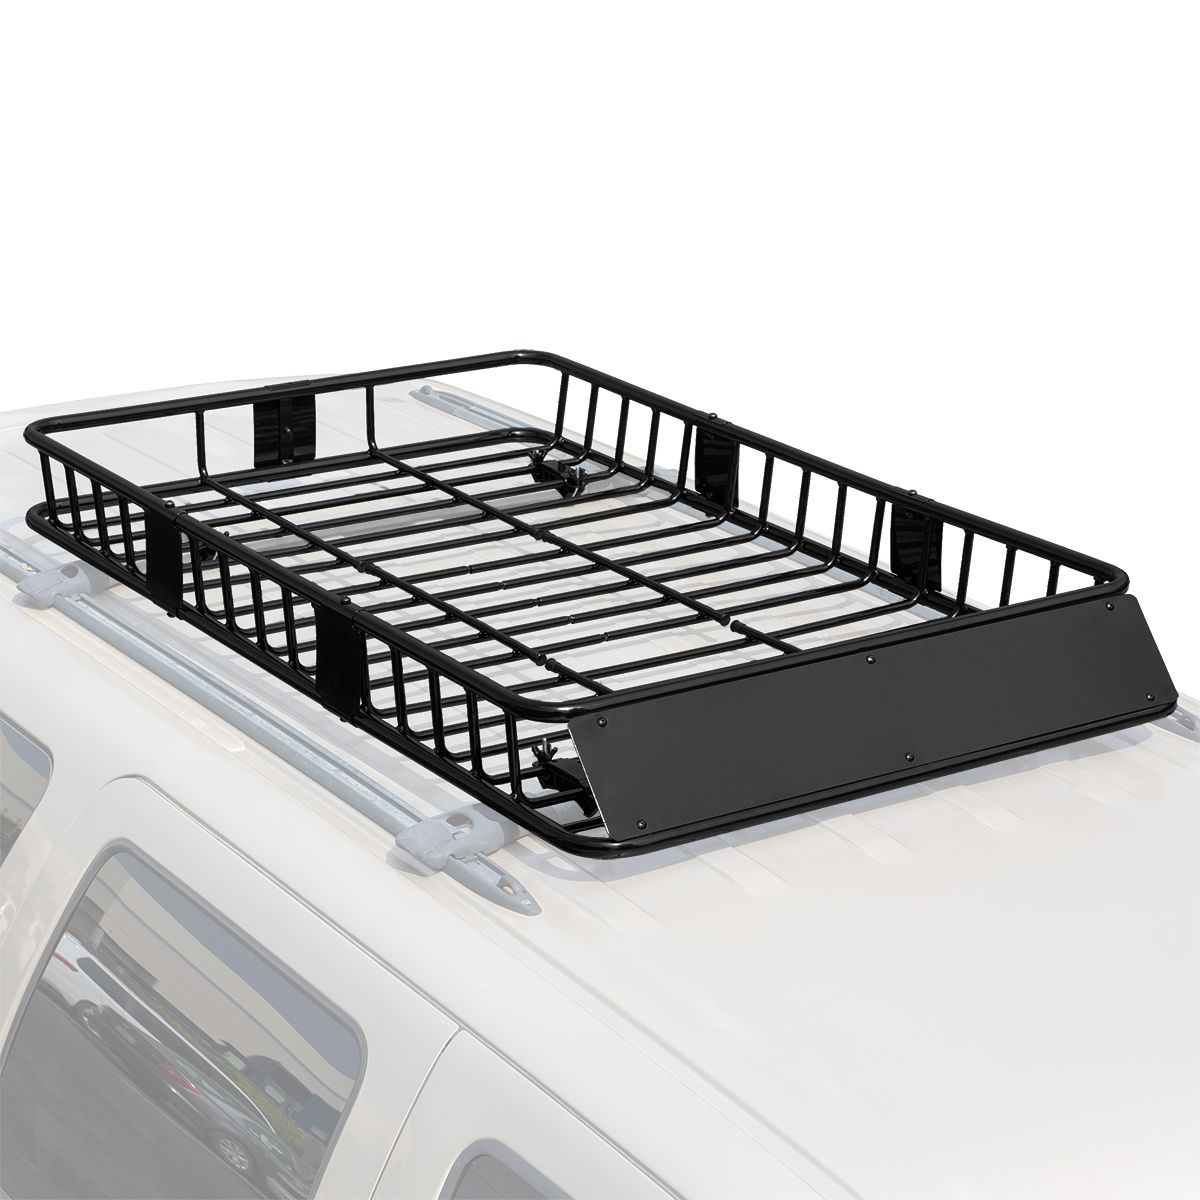 Stark 64 Universal Roof Rack Cargo Extension Car Top Luggage Holder Large Carrier Basket Walmart Com In 2020 Roof Rack Roof Basket Top Luggage